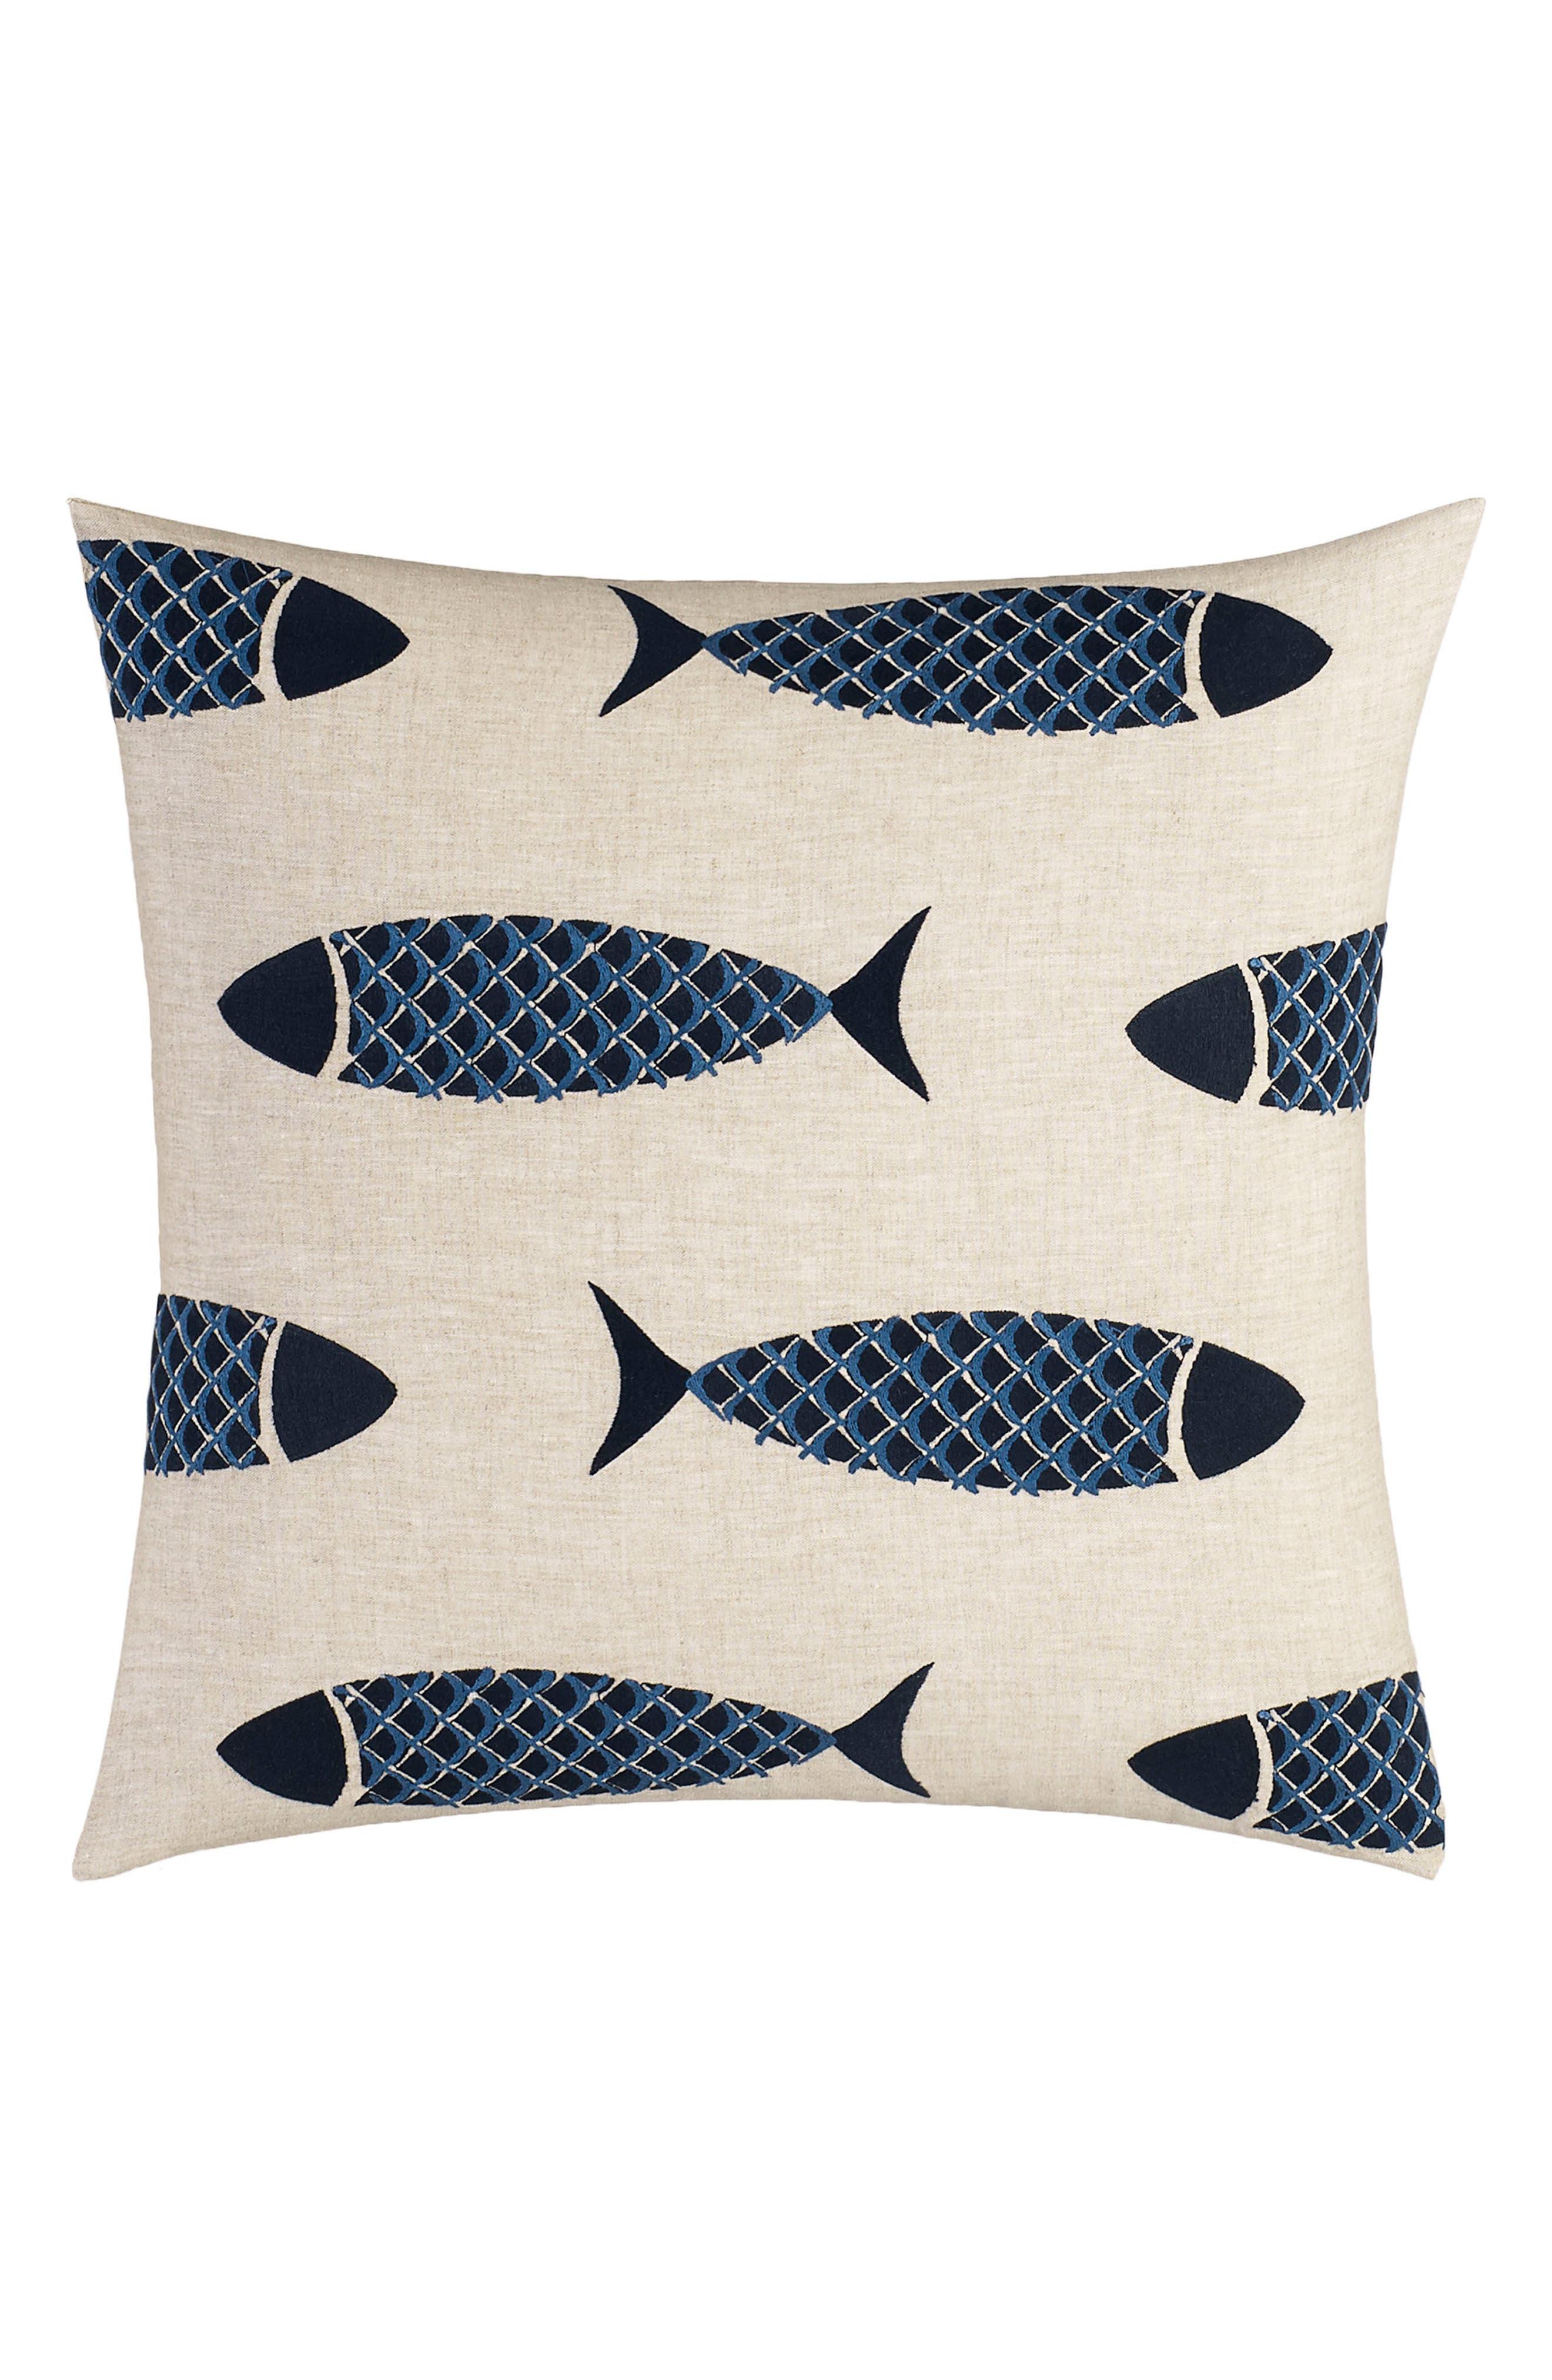 Main Image - Nautica Lockridge Embroidered Pillow